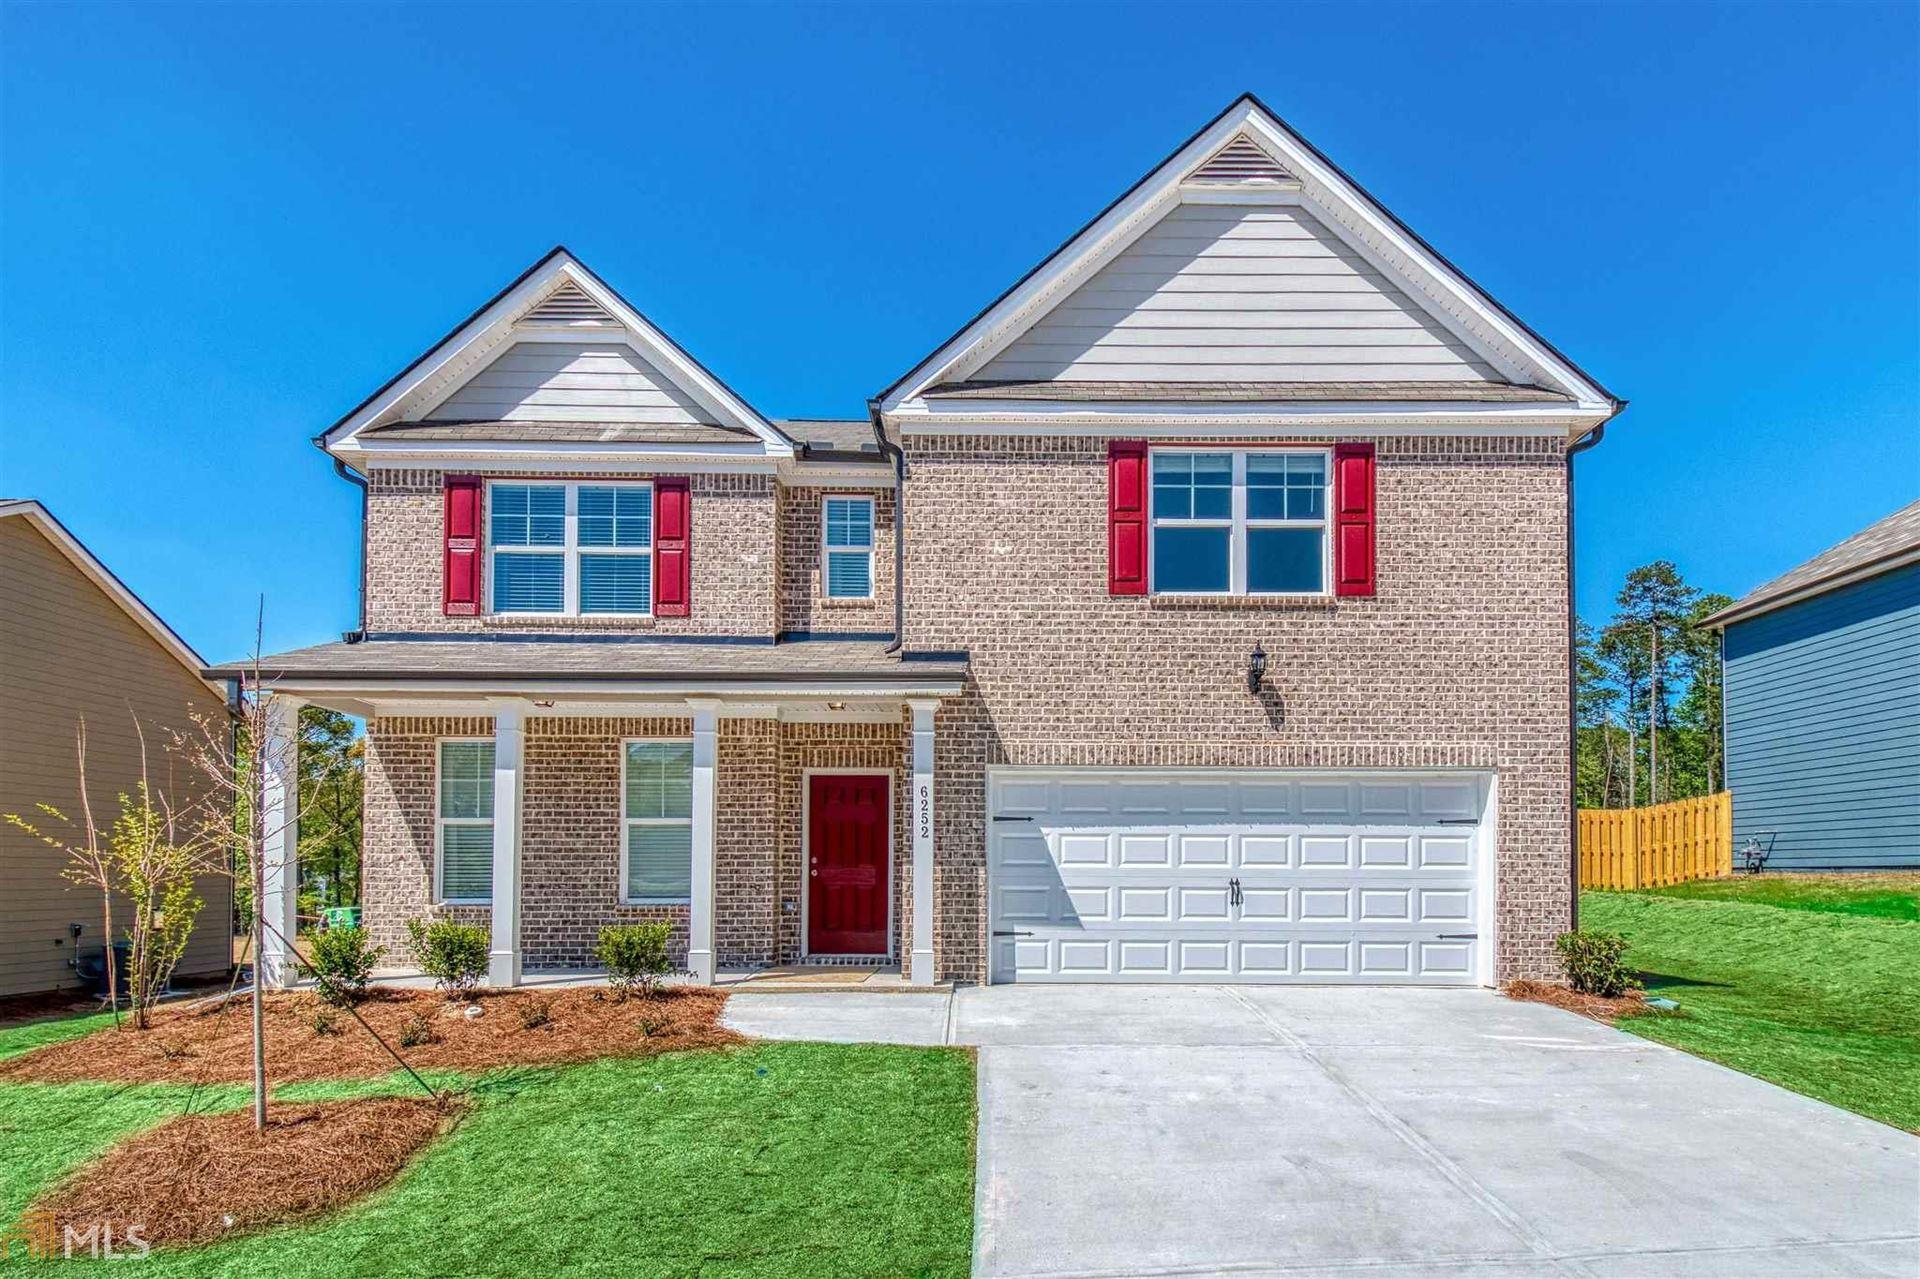 1340 Grove Park Ln, Jonesboro, GA 30236 - #: 8864106